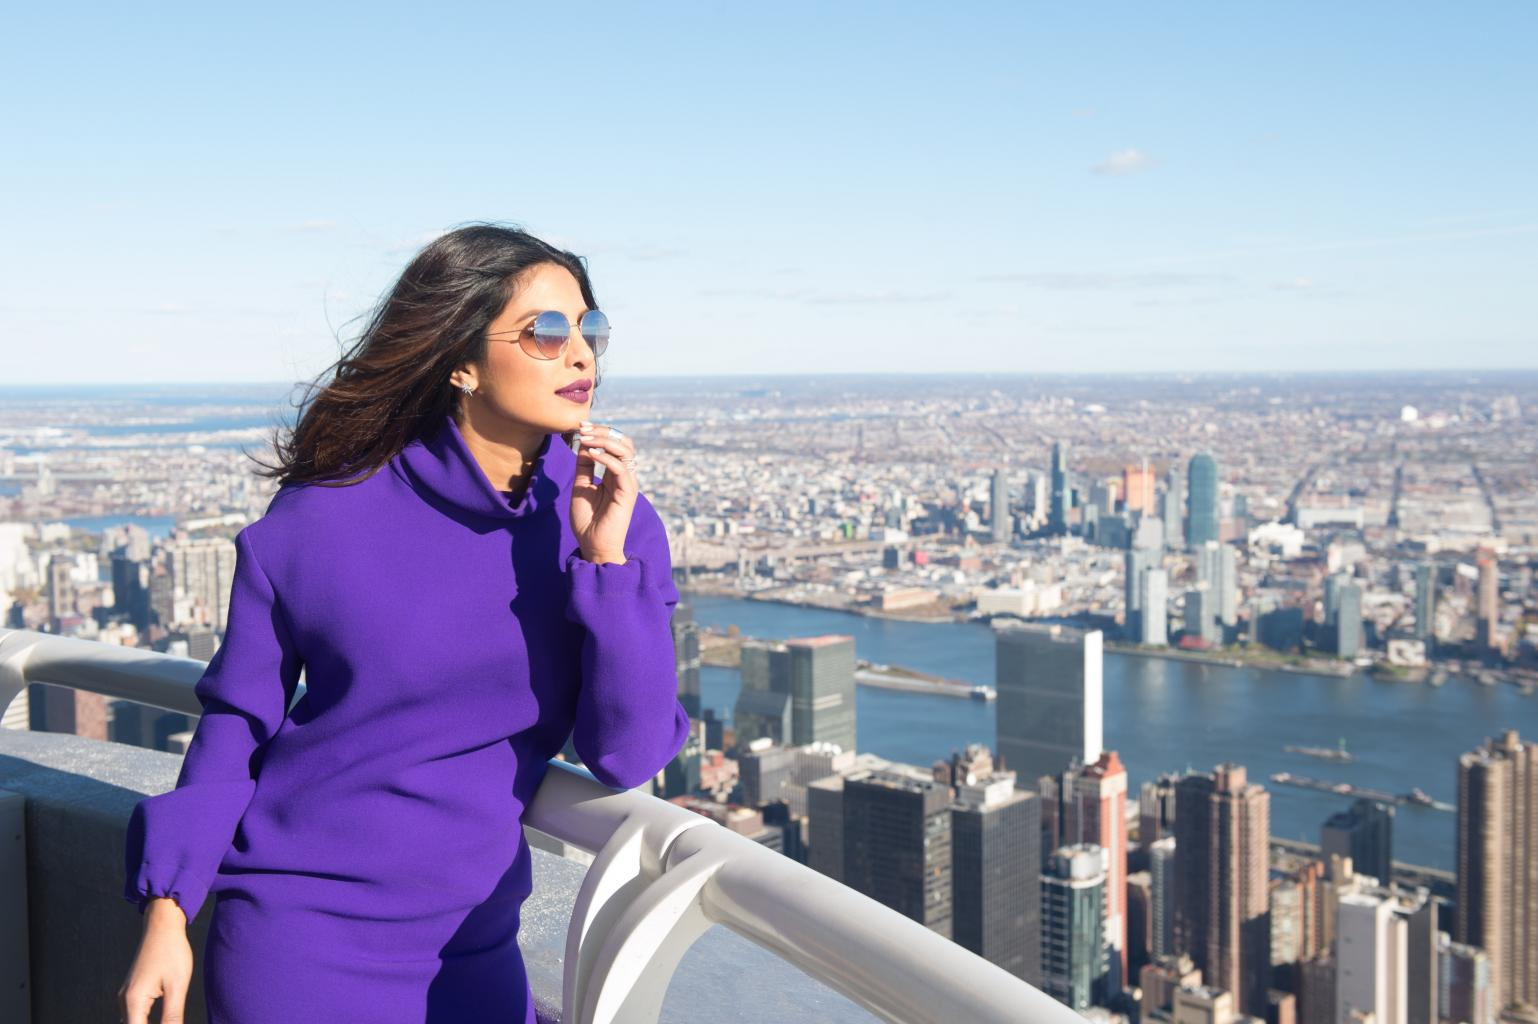 Priyanka Chopra Says    Being Objectified Is Part of My Job